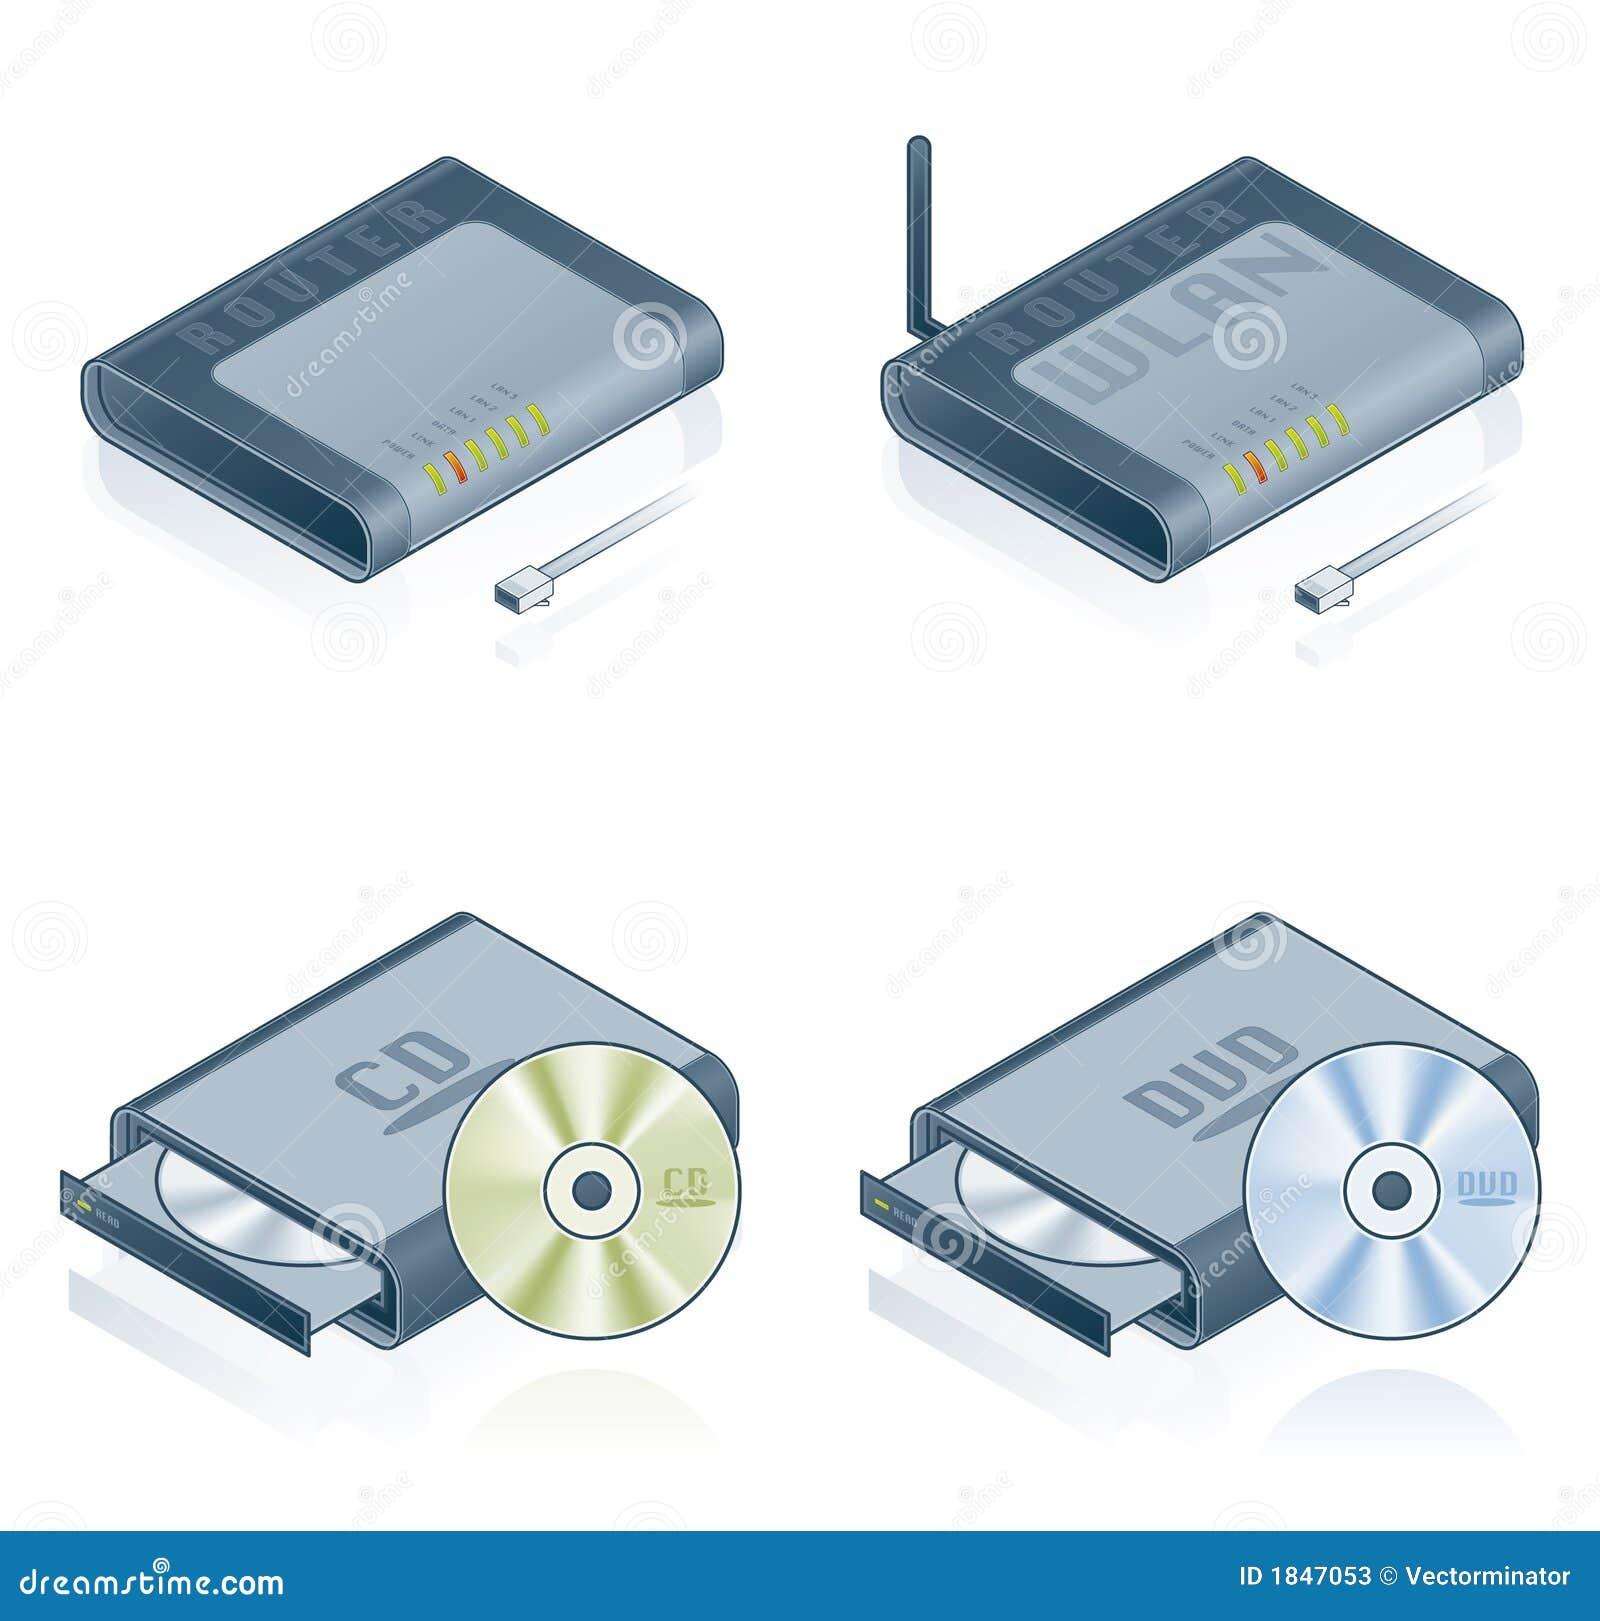 Computer Hardware Icons Set - Design Elements 55b